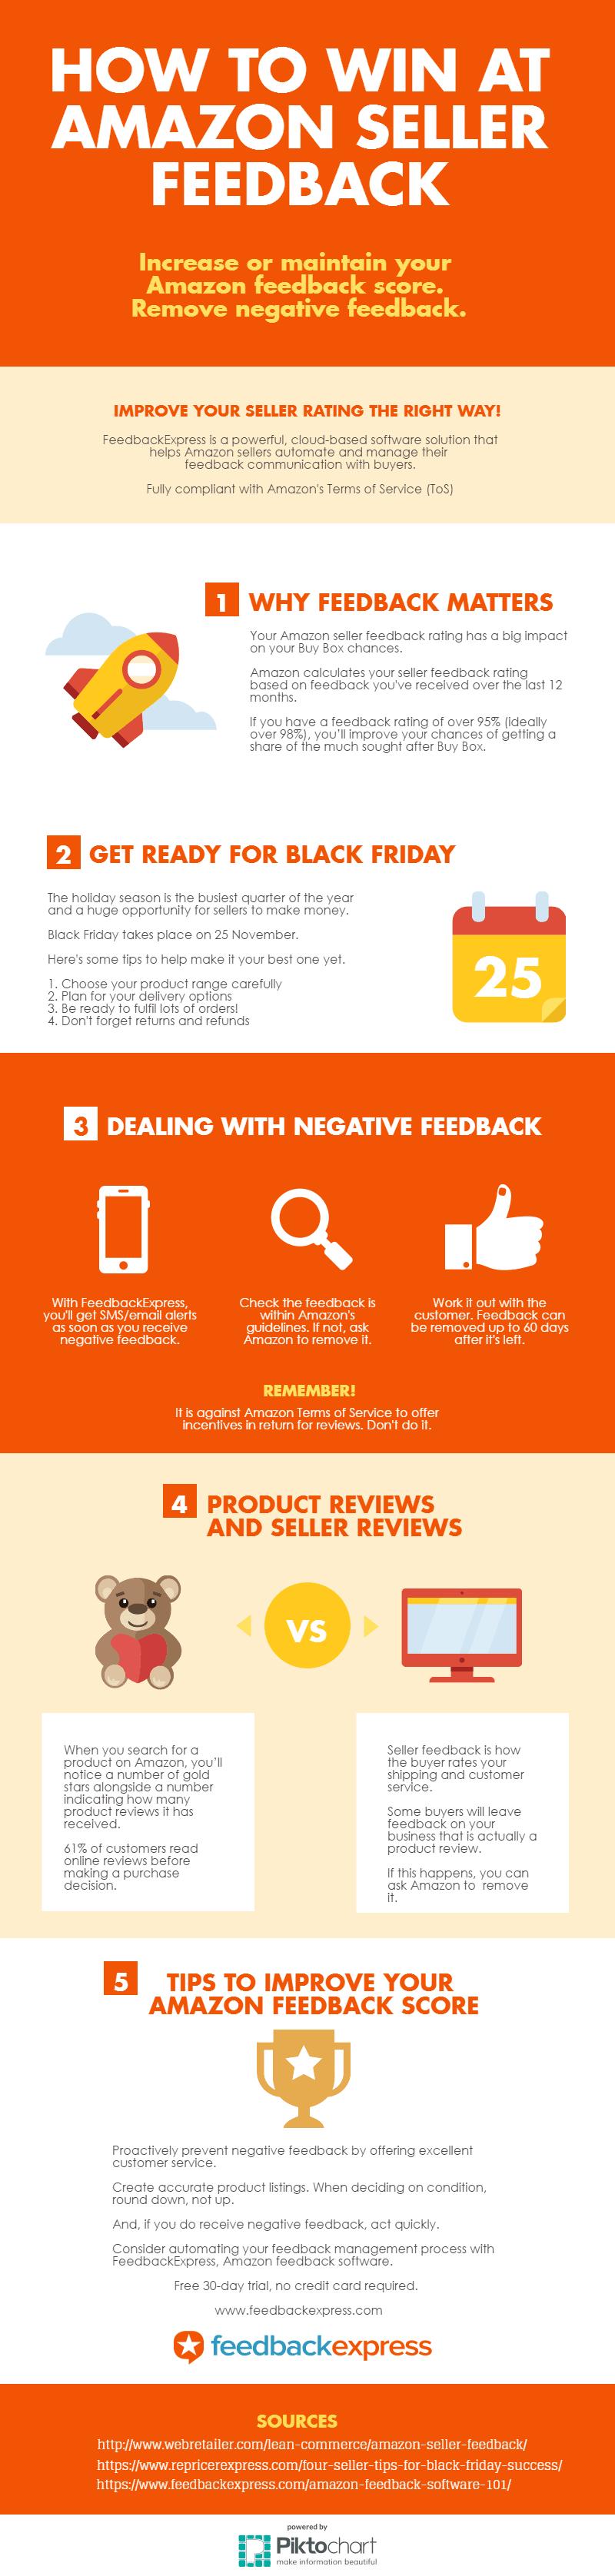 feedbackexpress-infographic-amazon-feedback-software